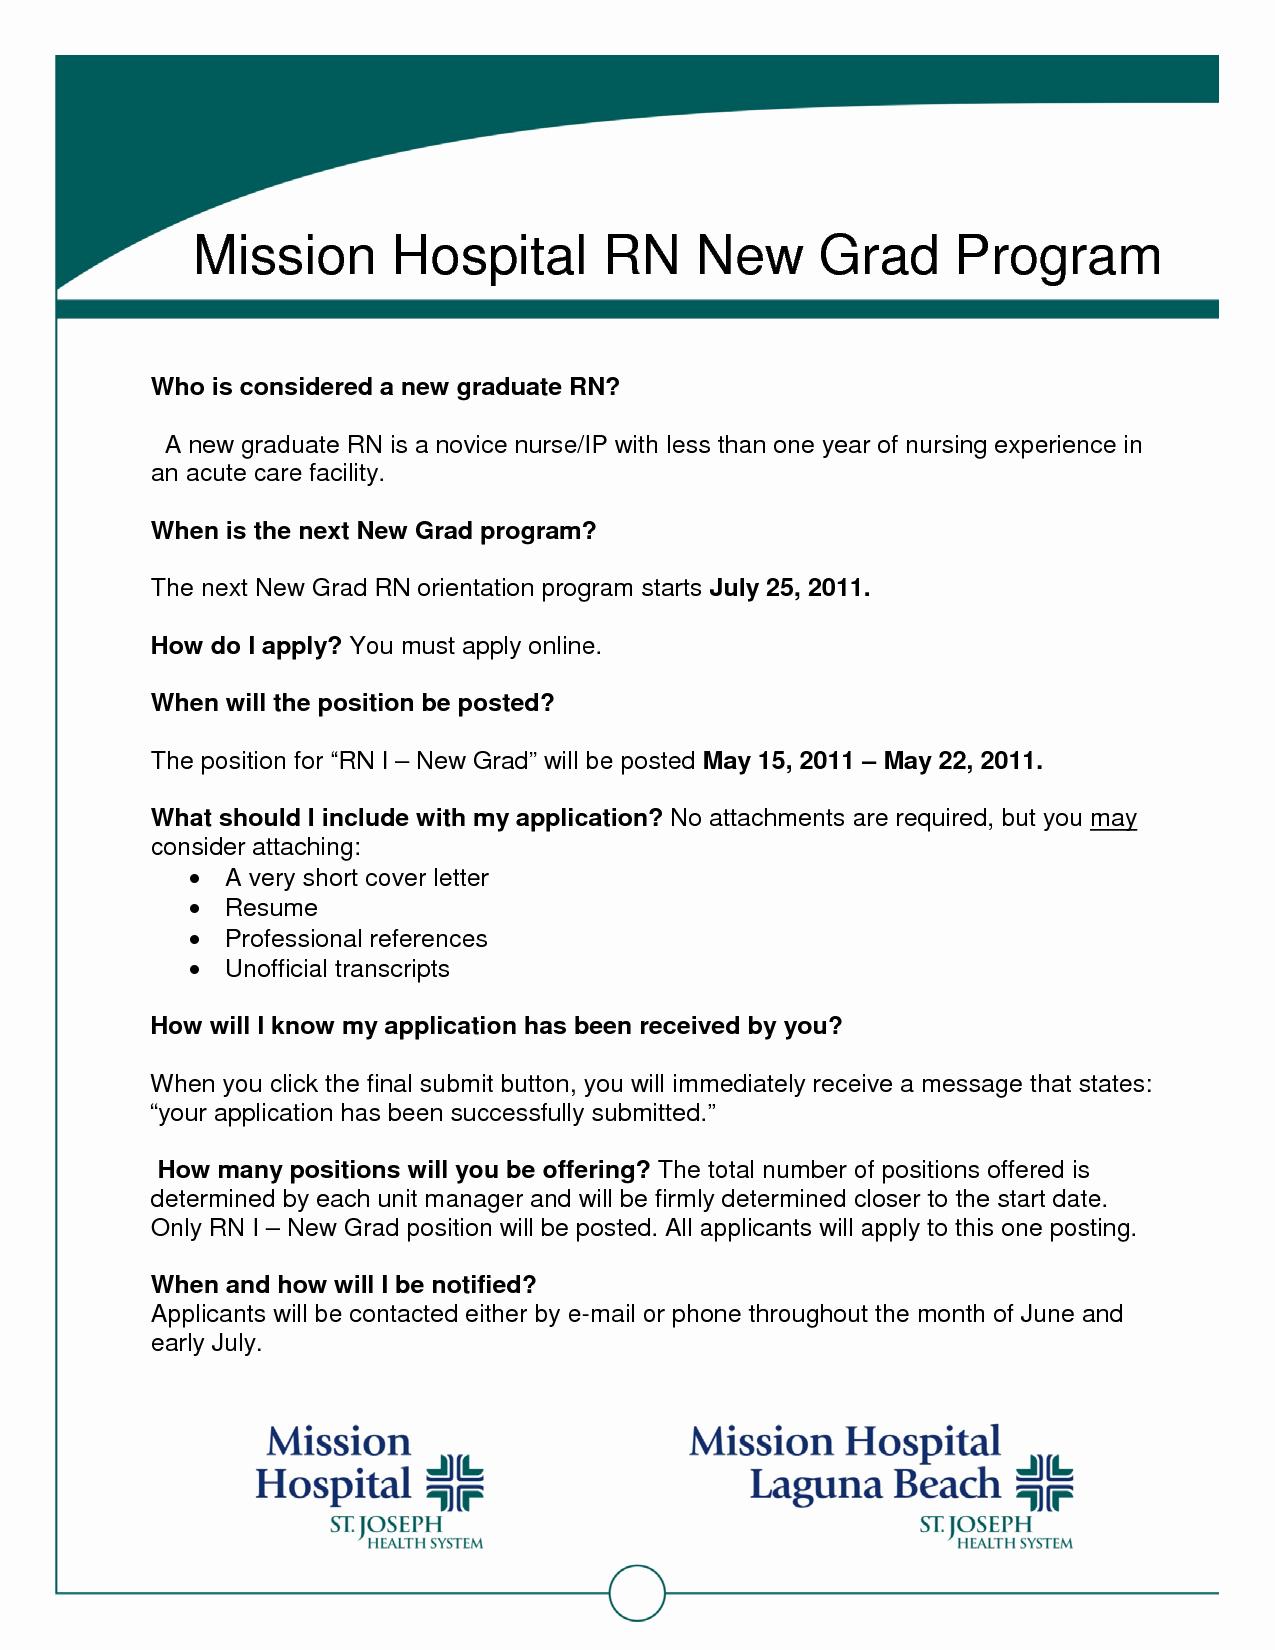 New Graduate Nurse Resume Skills Nursing Examples for